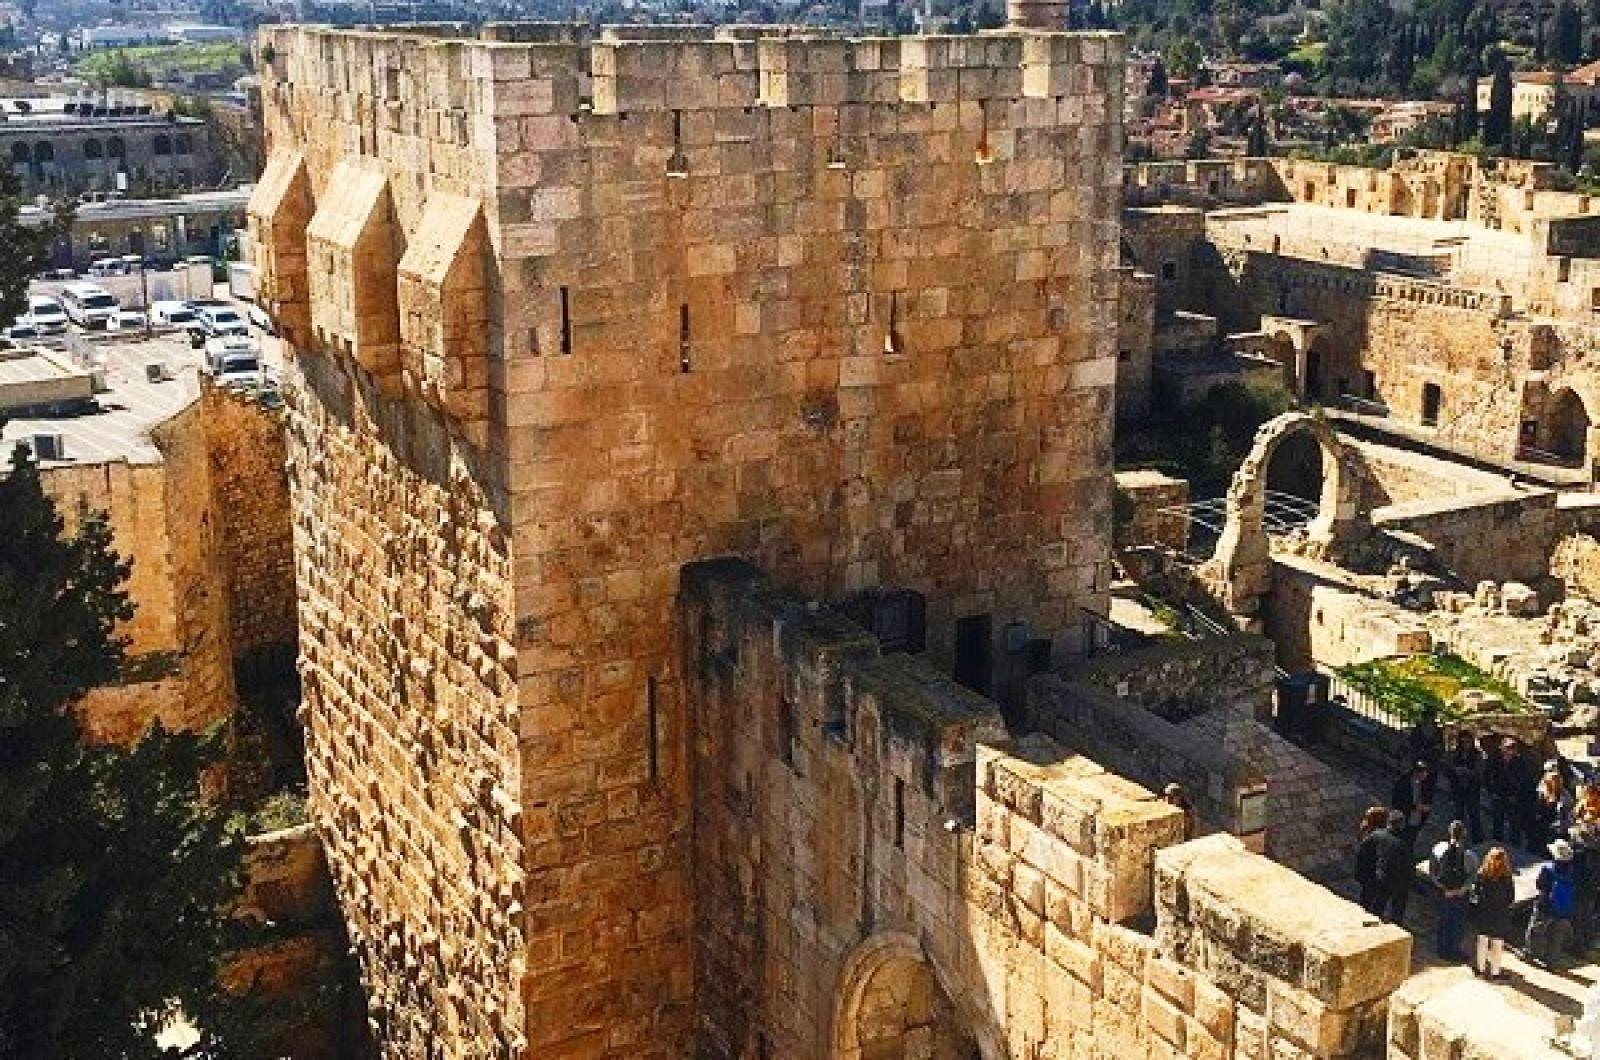 Башня Давида. Исторический взгляд на Иерусалим